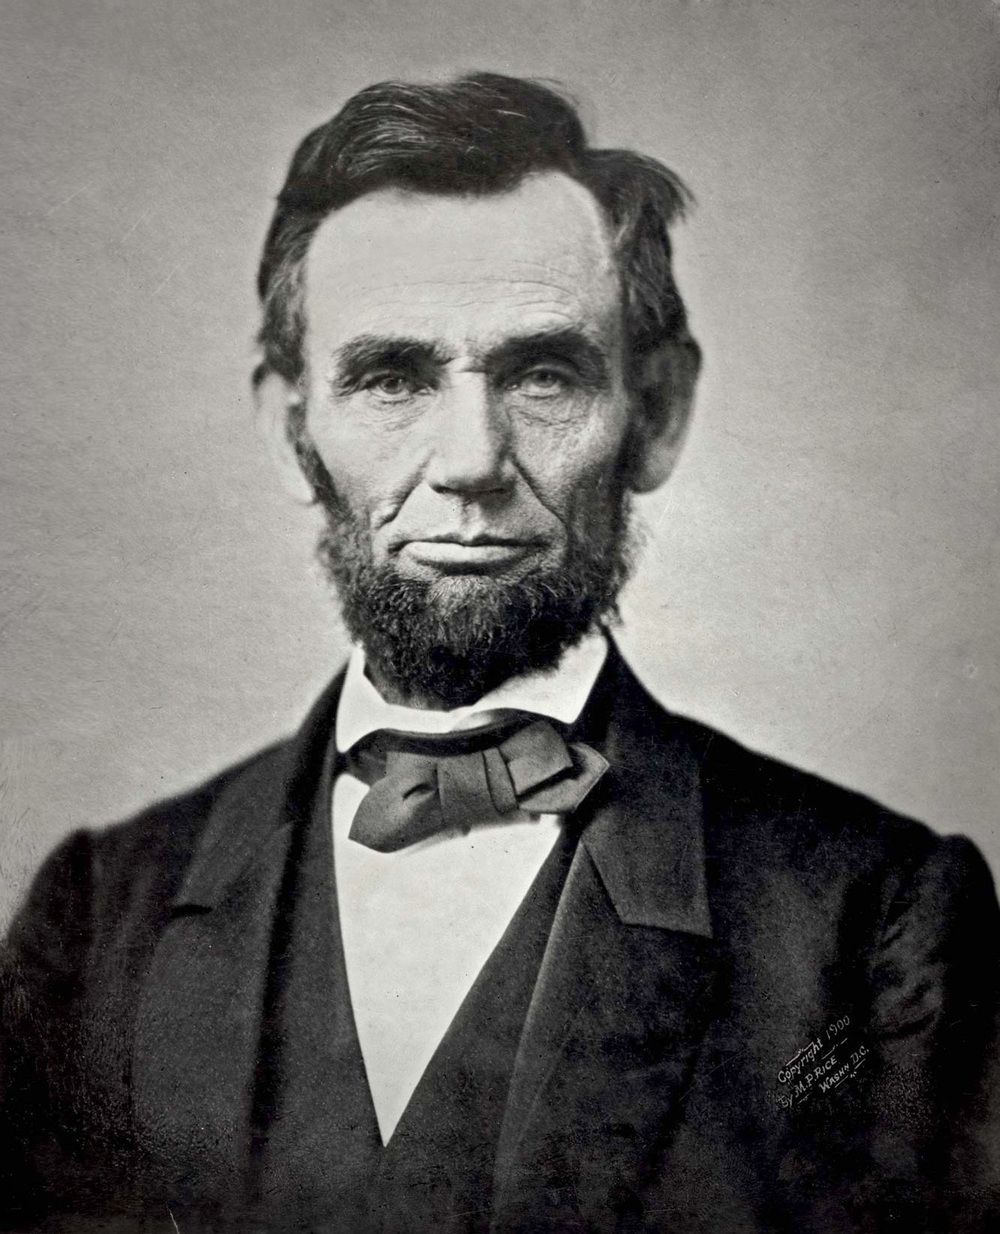 Photo source: Wikipedia